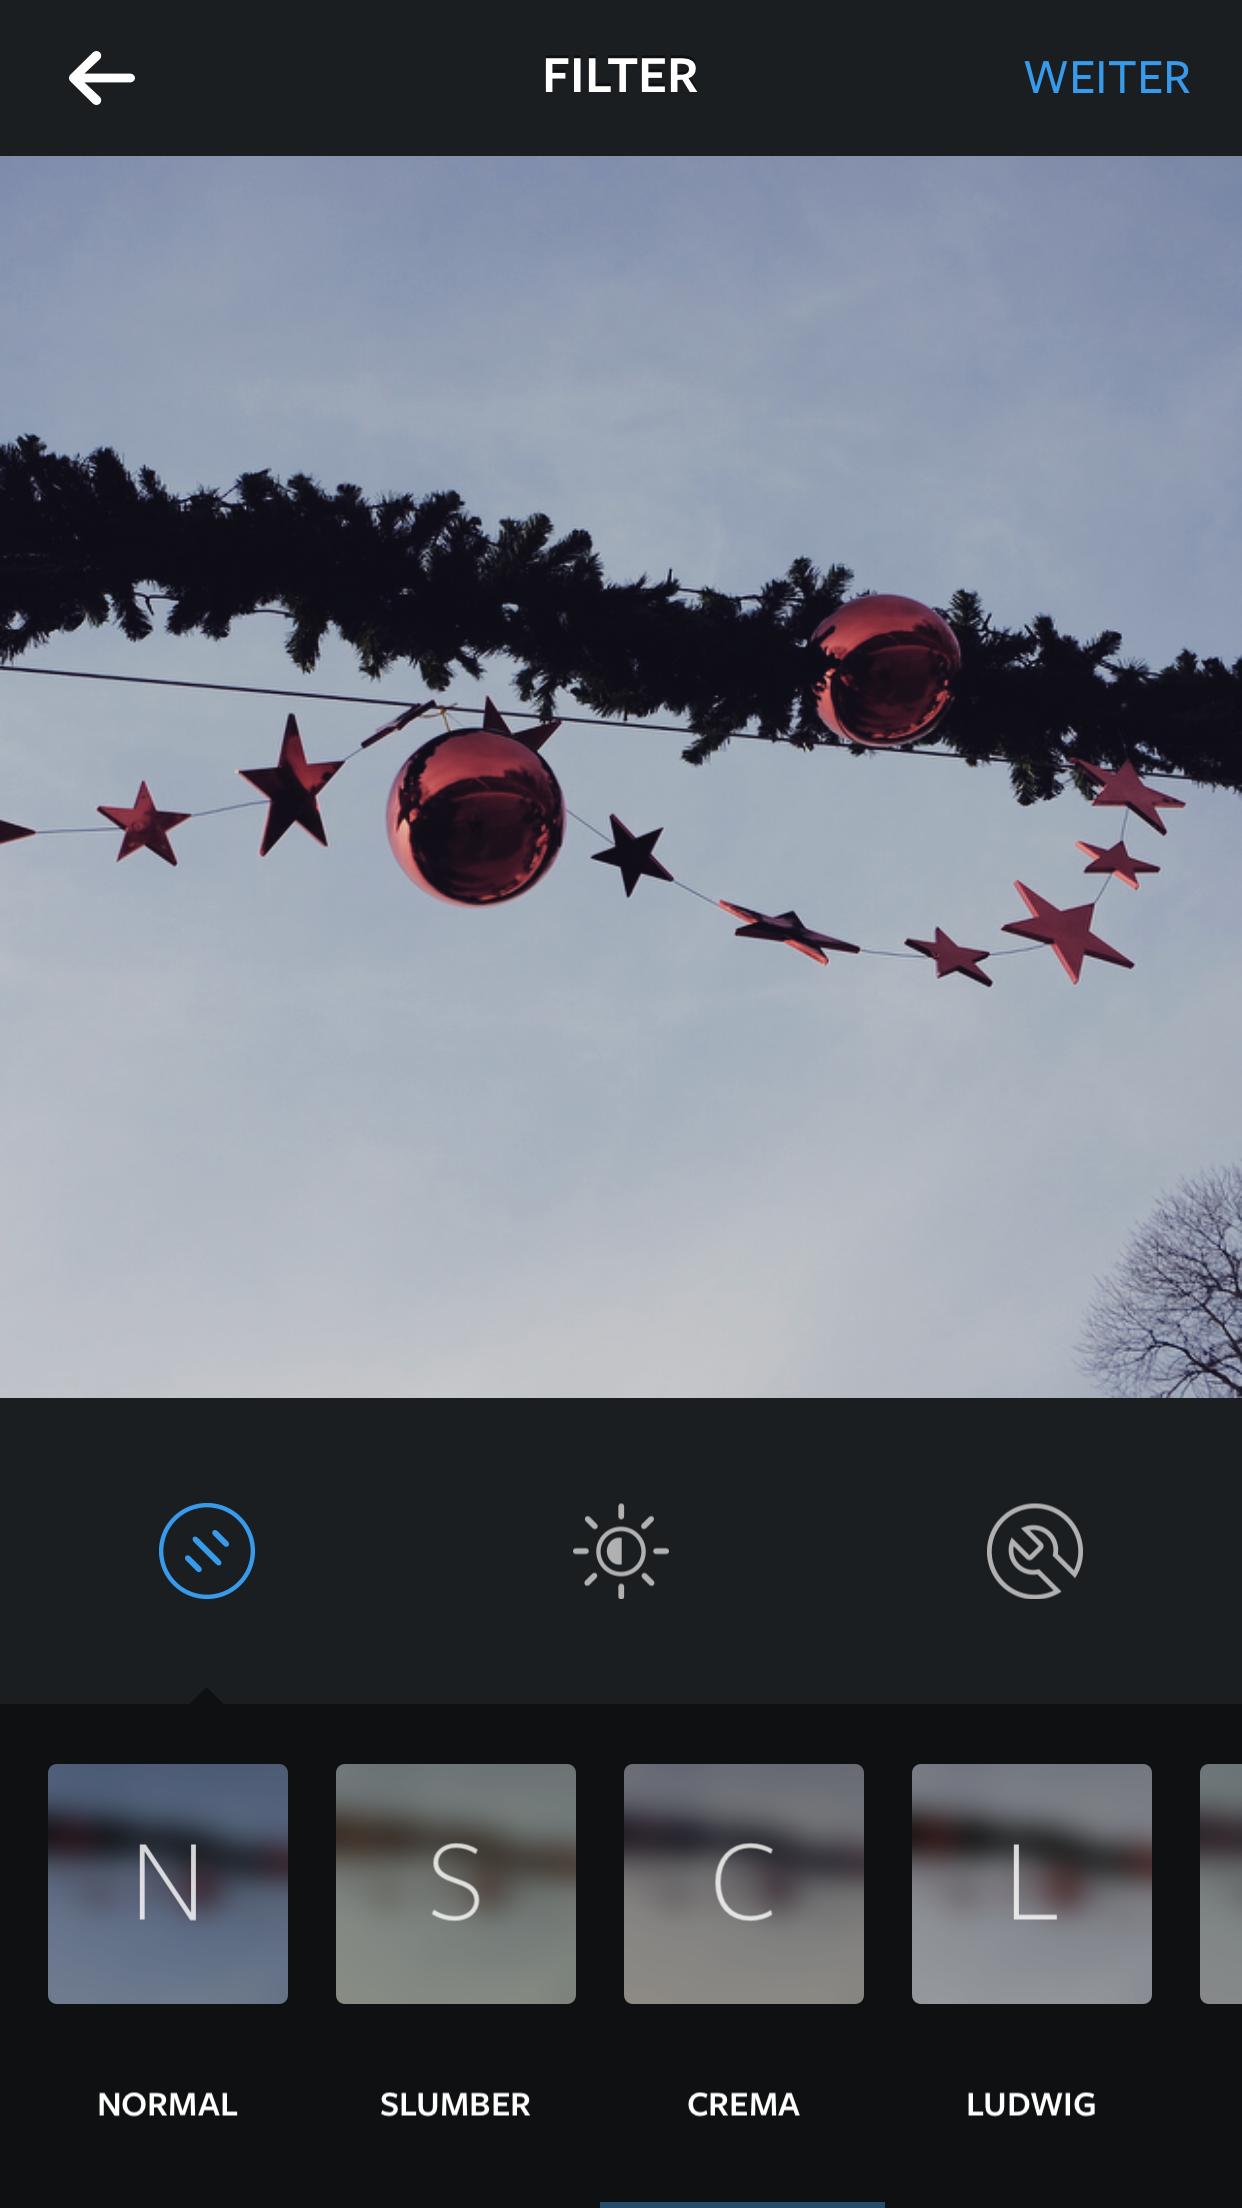 Instagram Filter Crema